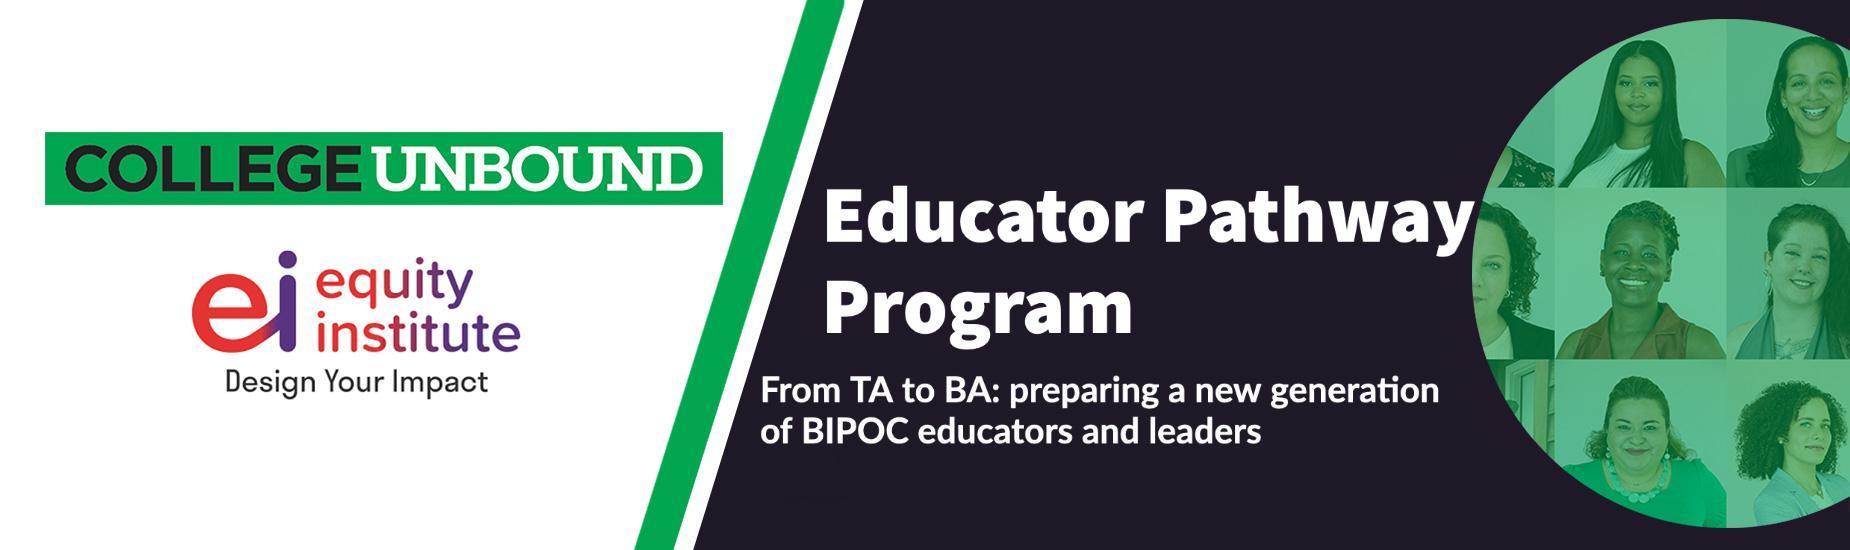 Educator Pathway Program